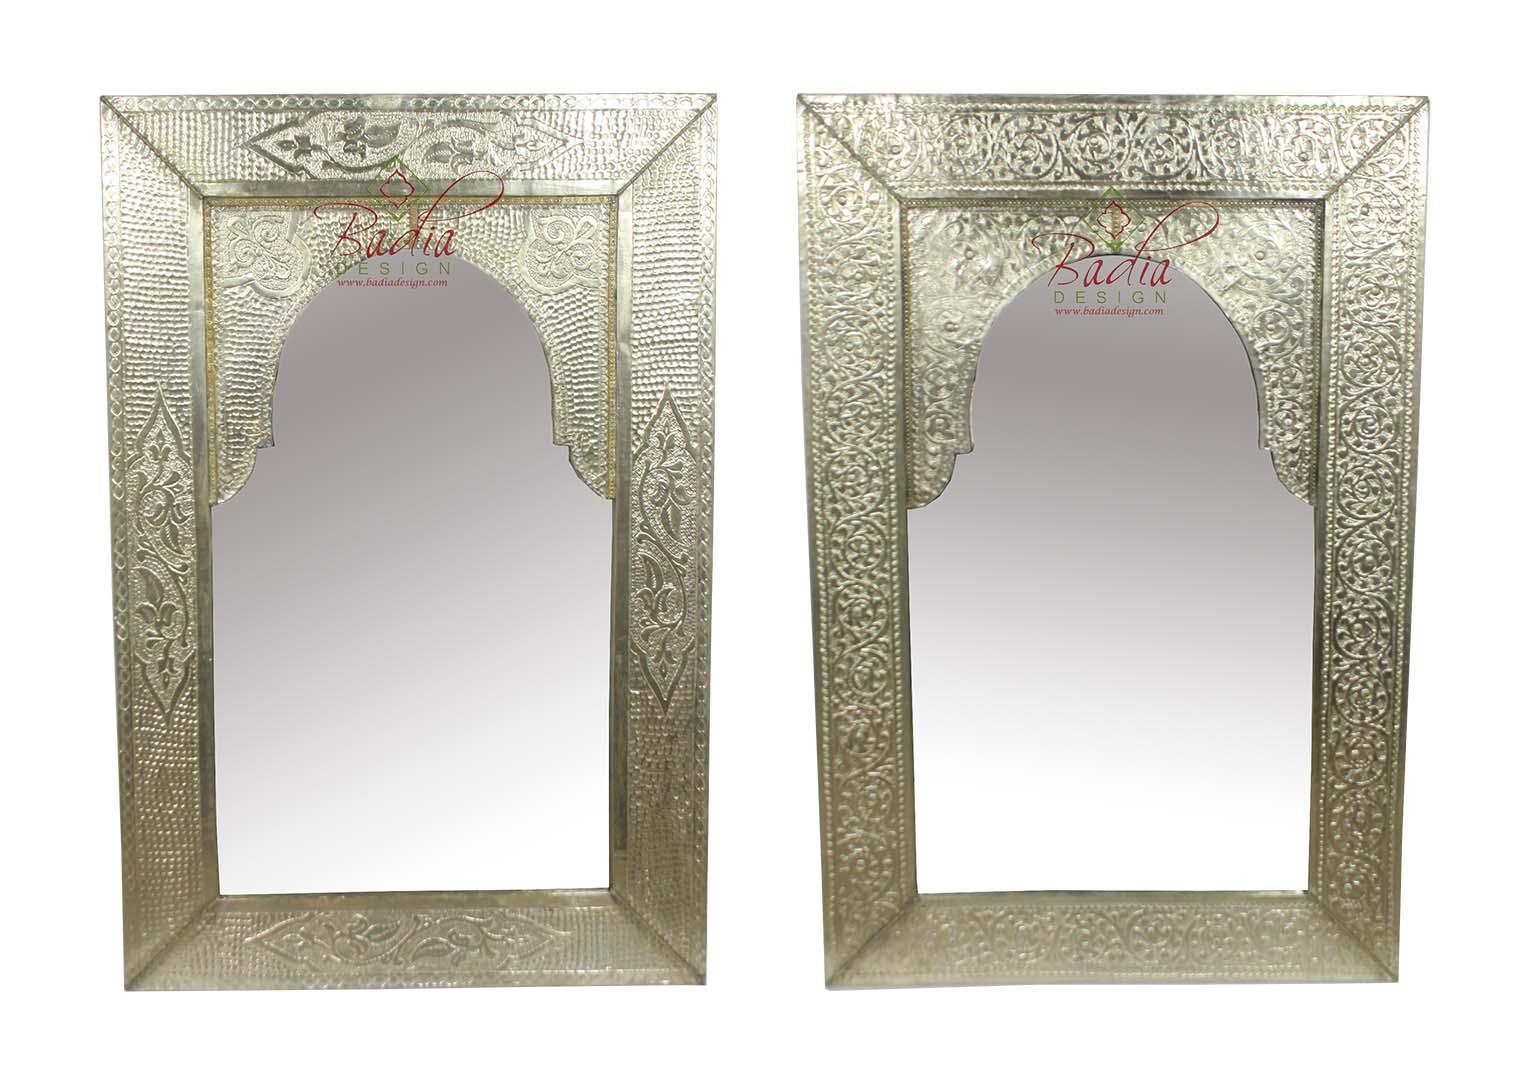 moroccan-silver-nickel-mirror-m-em012.jpg